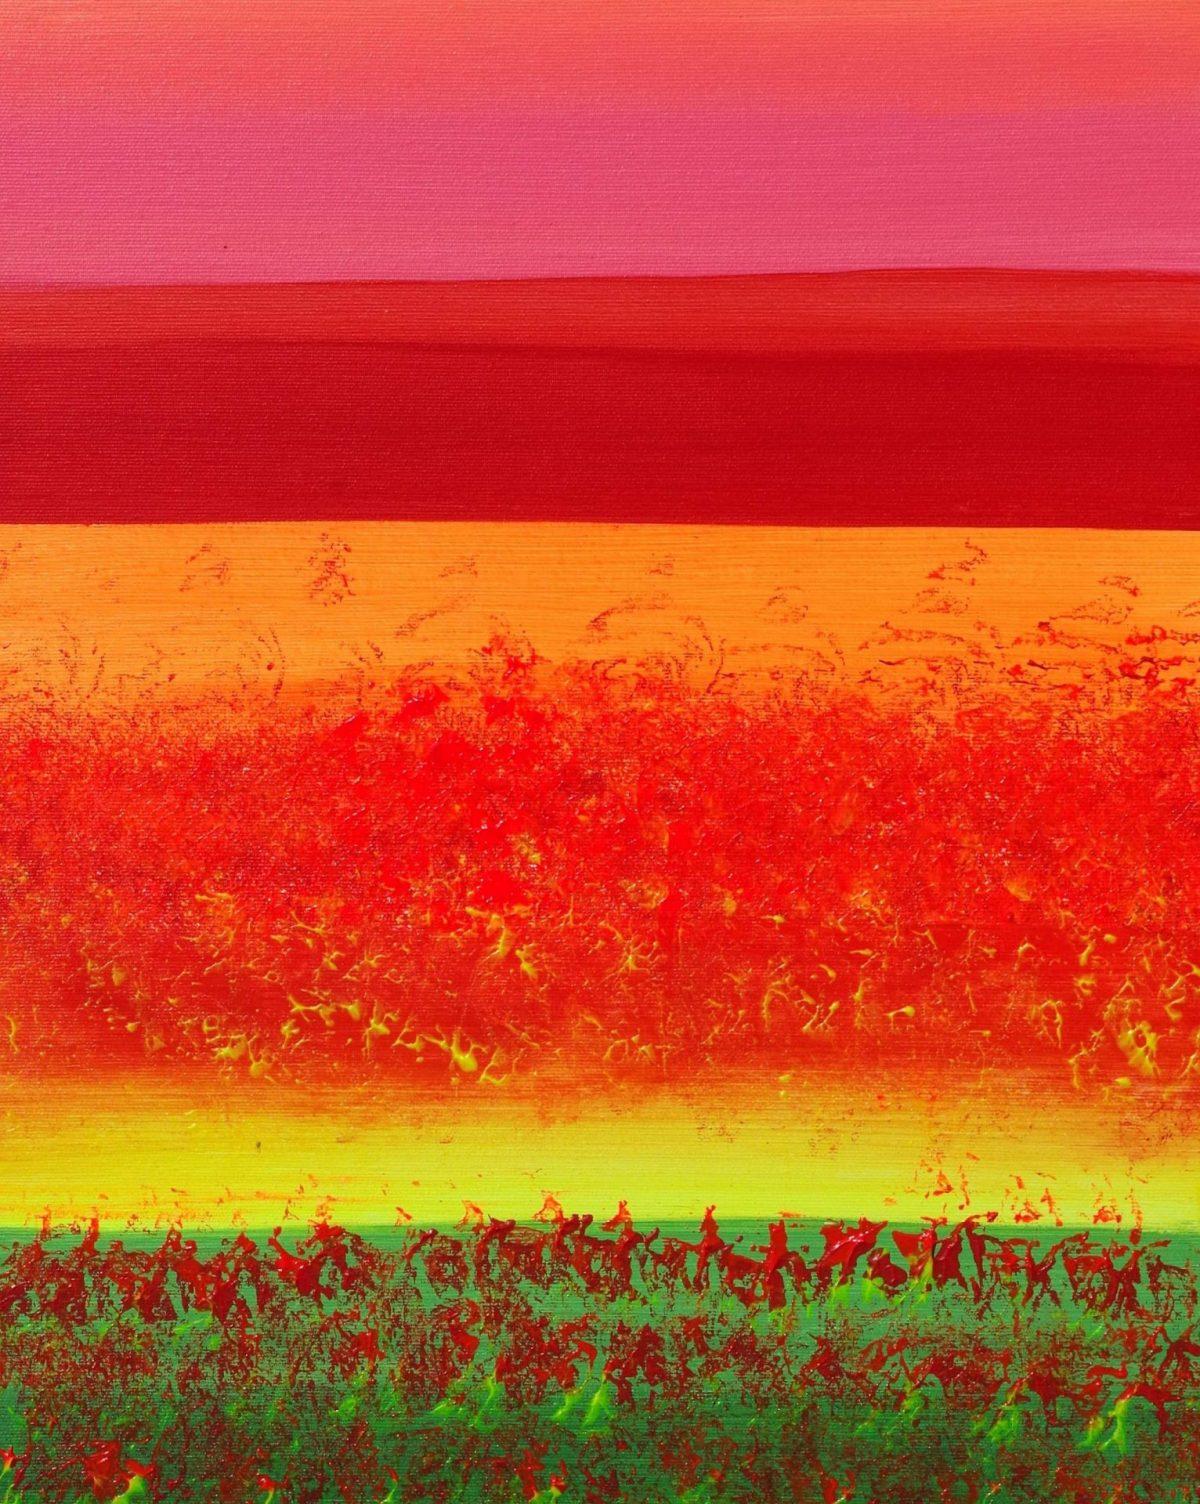 Horizons, 2 40x50 acrylic_quadro astratto in vendita online